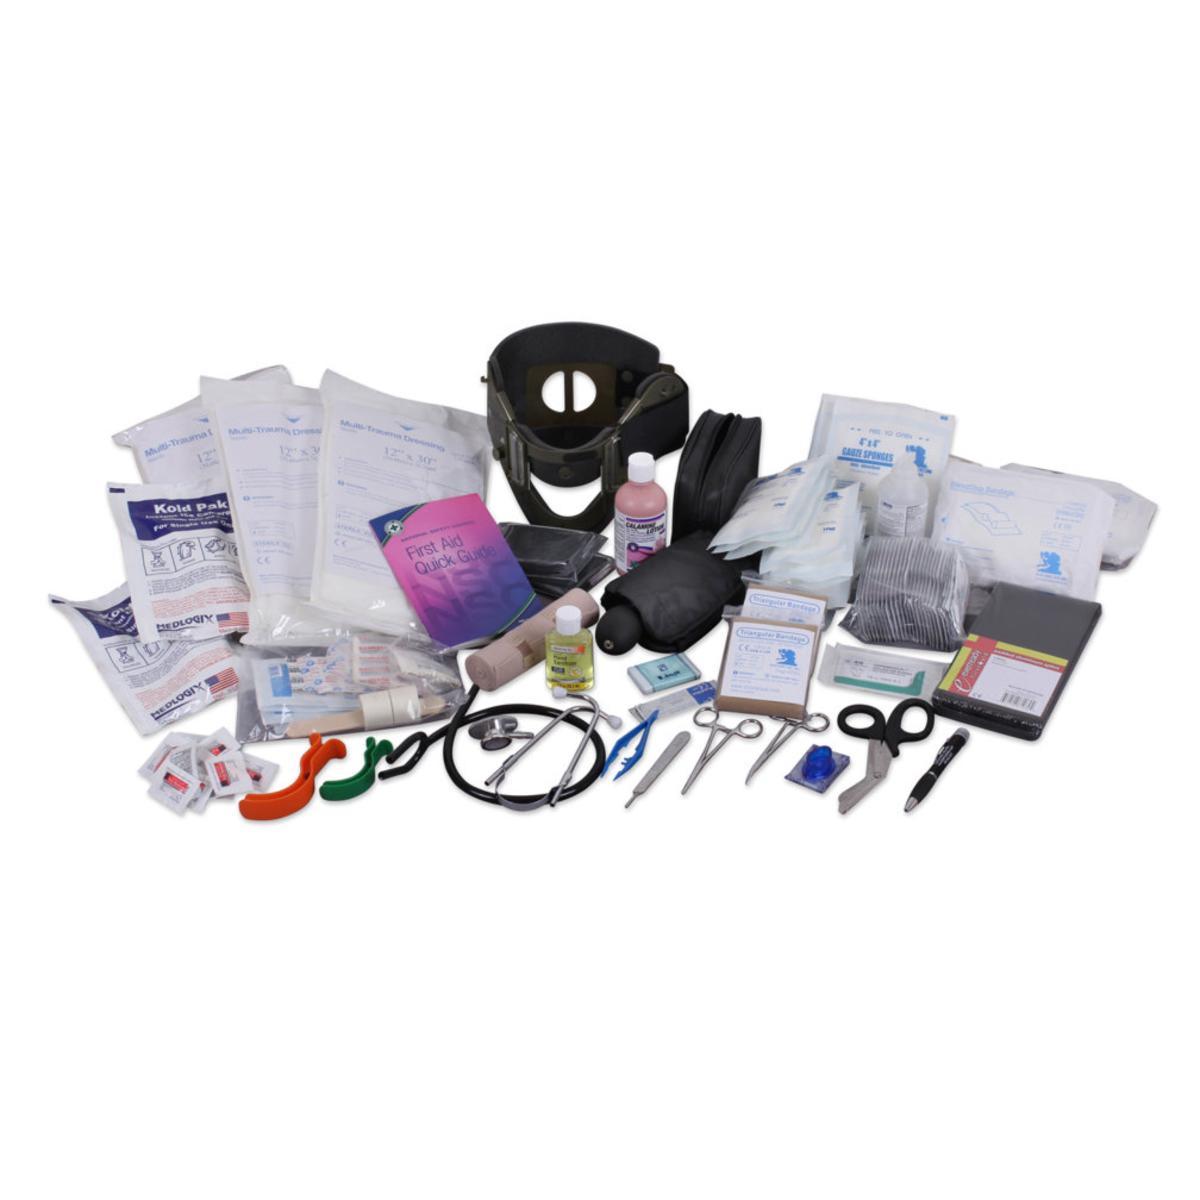 rothco emt medical trauma kit emt bag w - First Aid Supplies